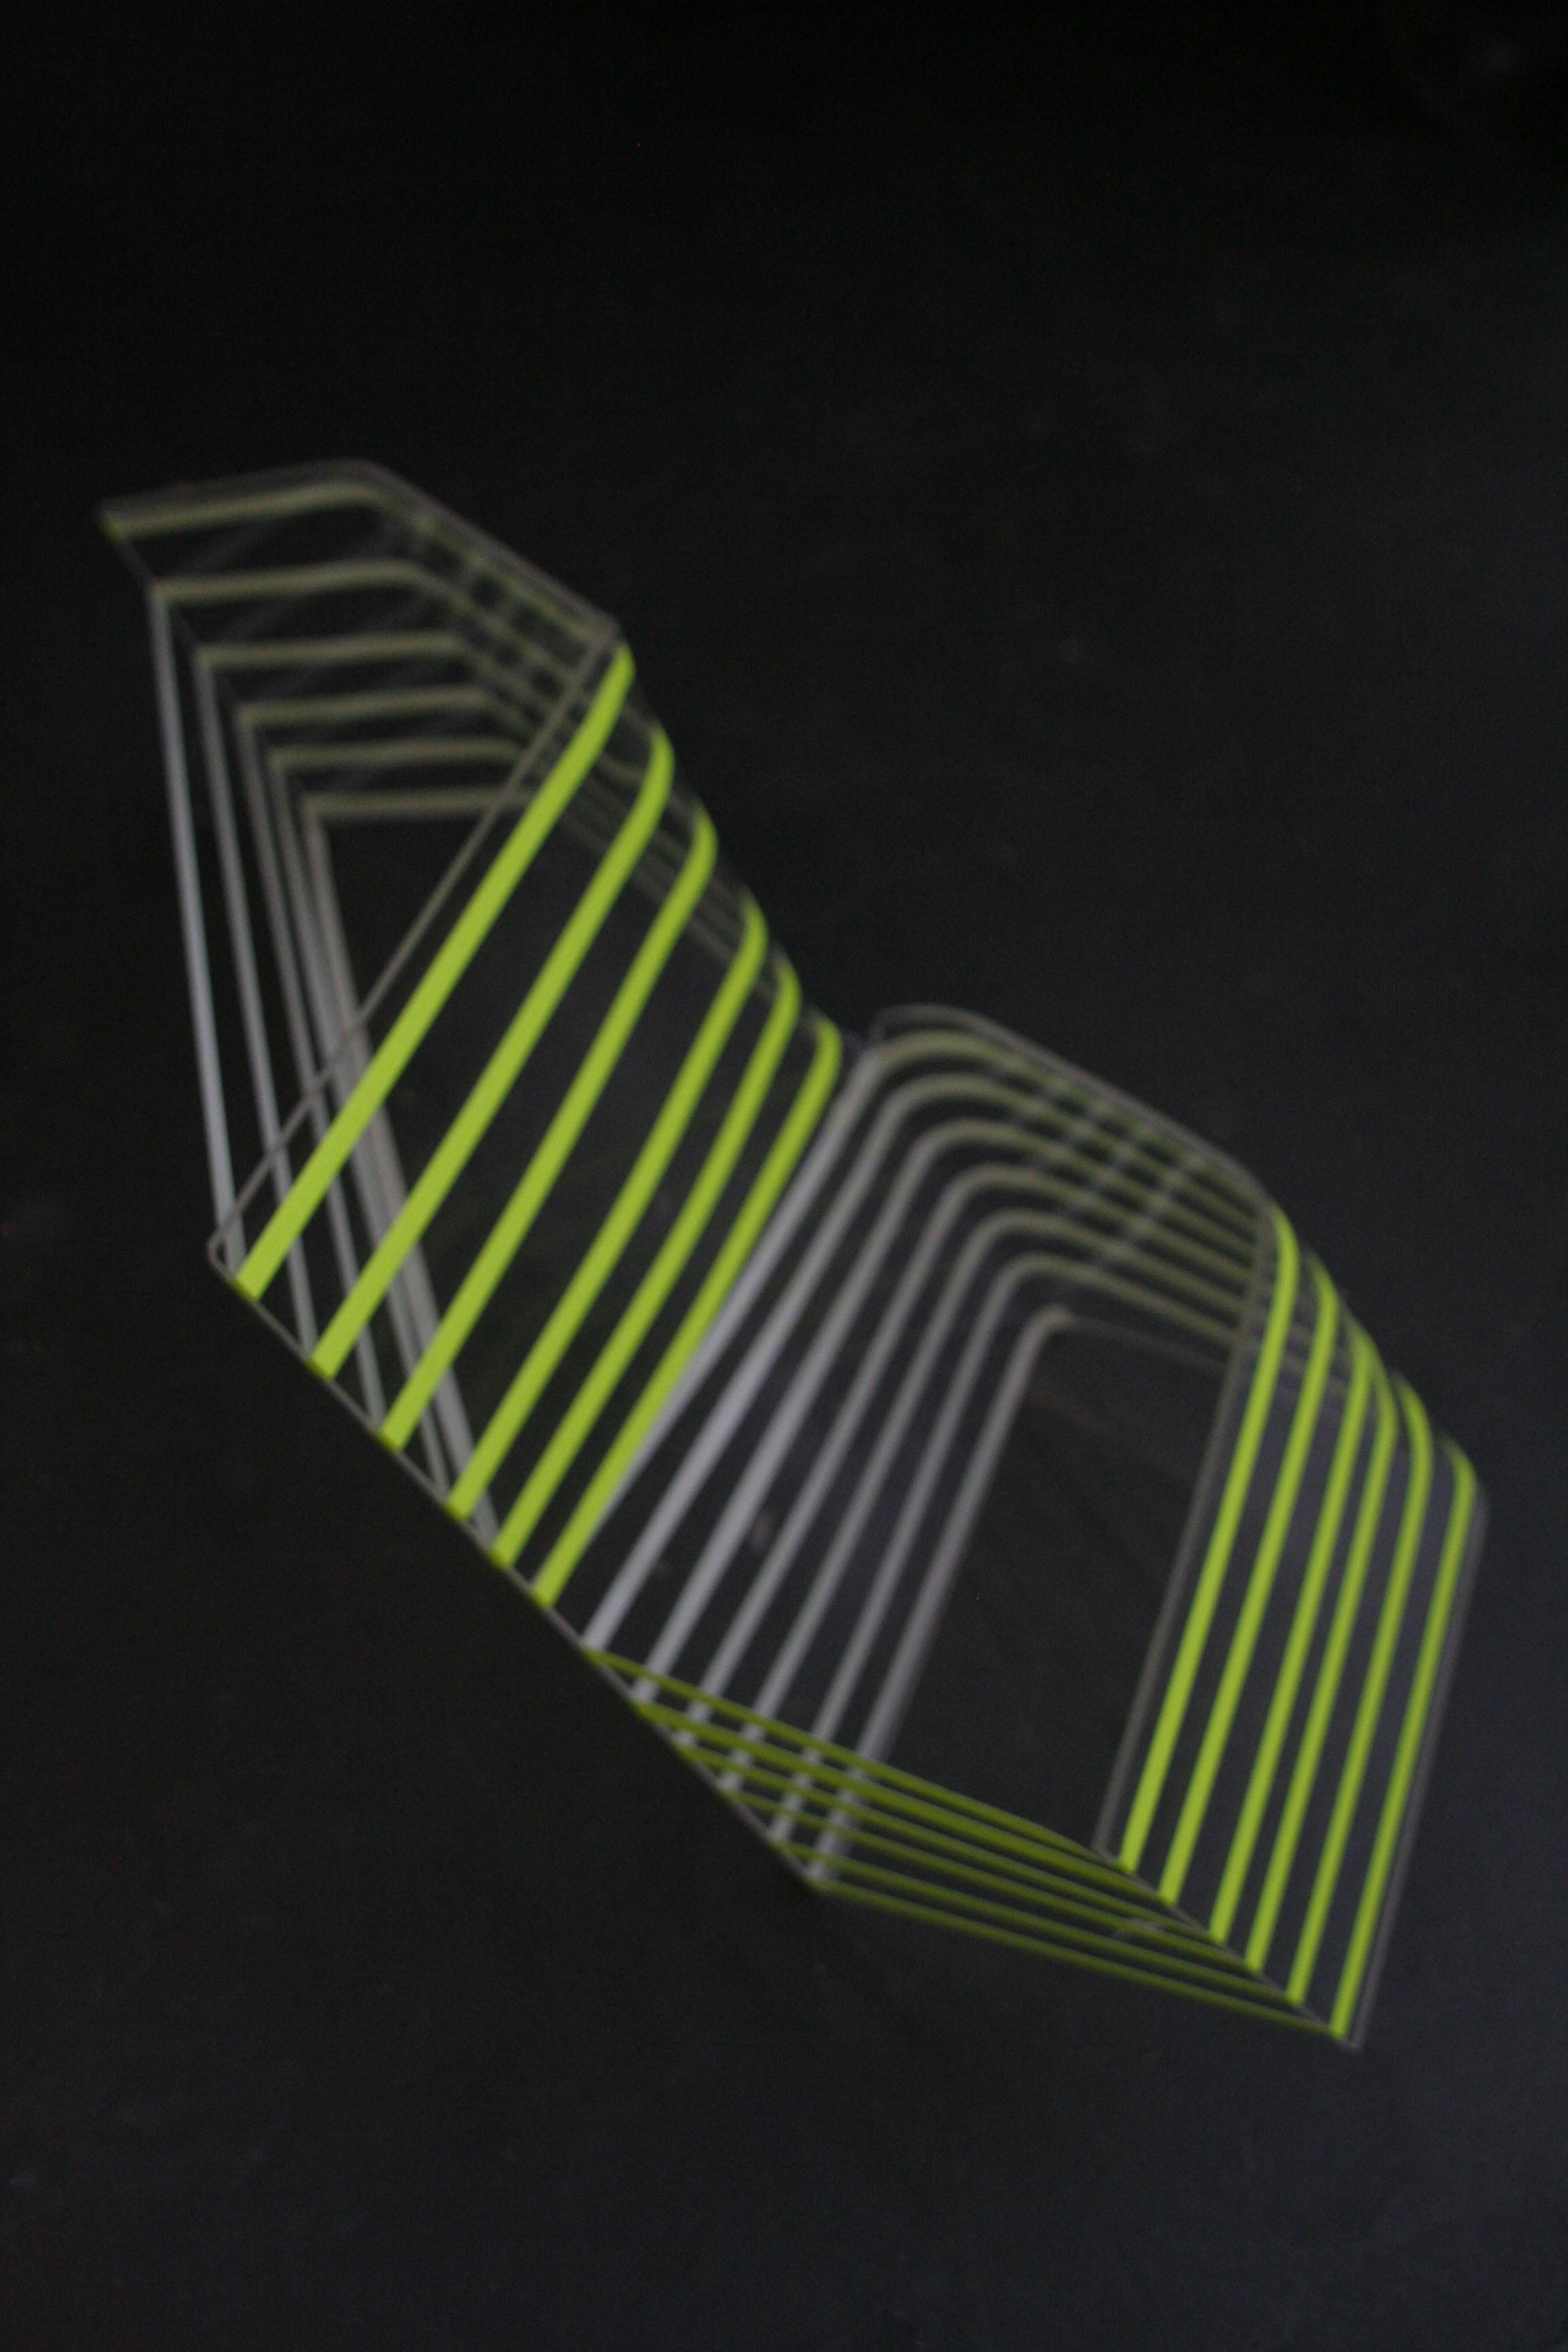 Spaces (perspex, tape)